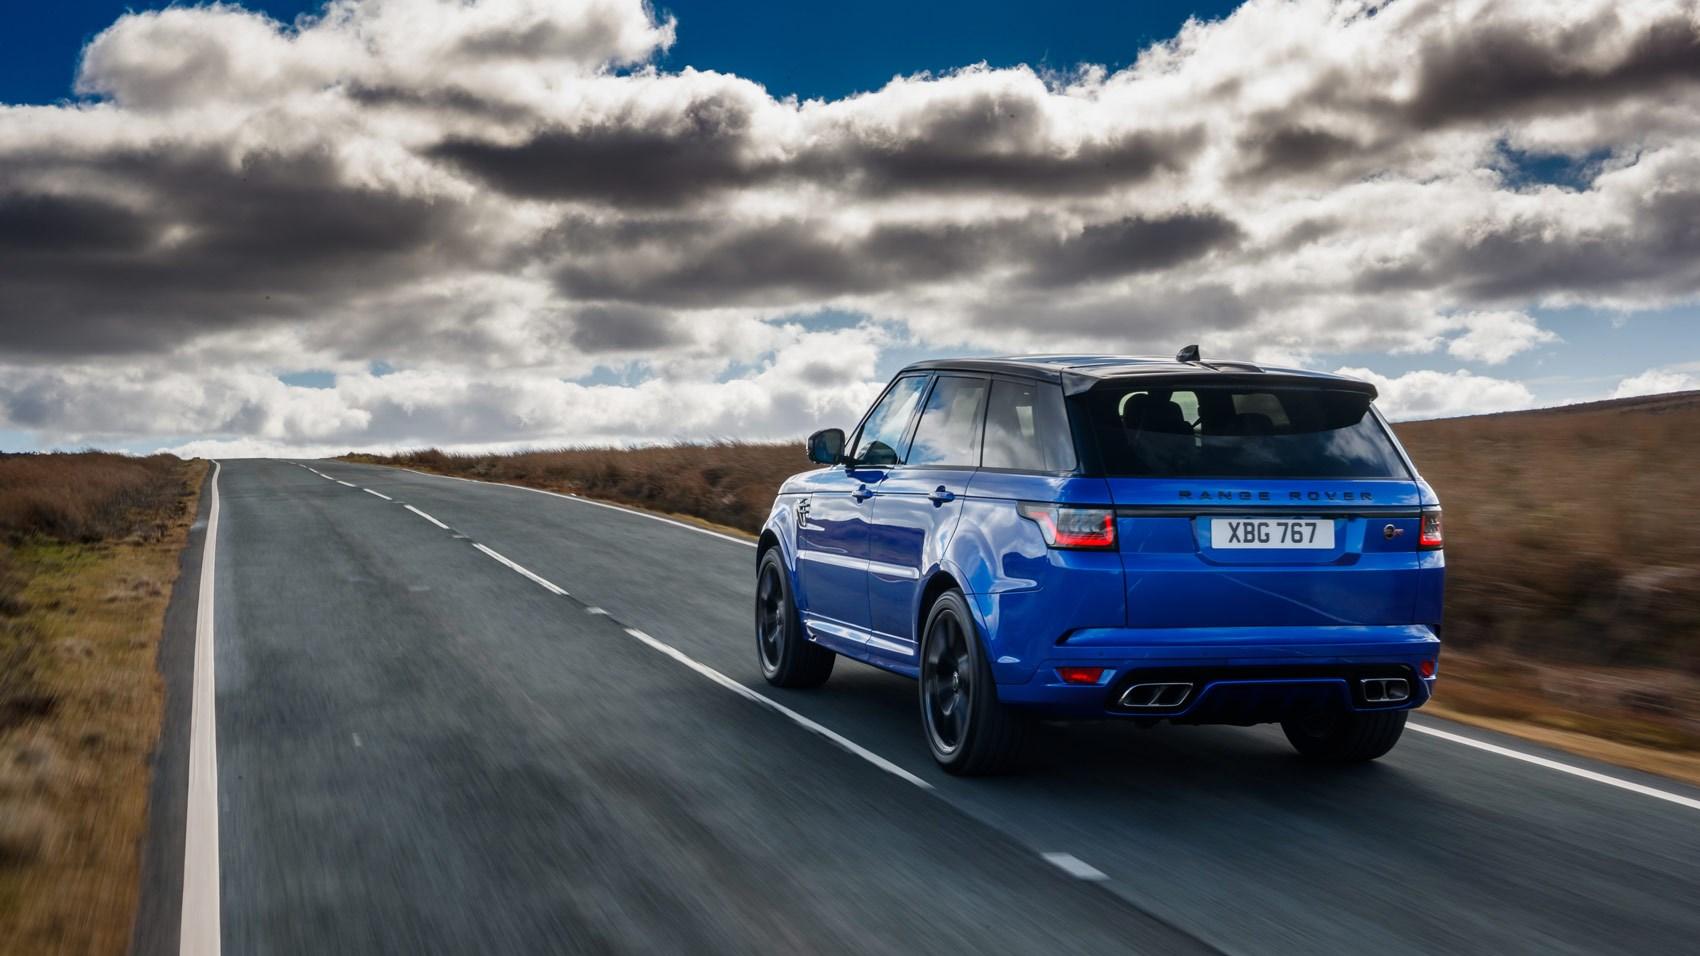 Range Rover Sport Svr 2018 Review Thor On Wheels Car